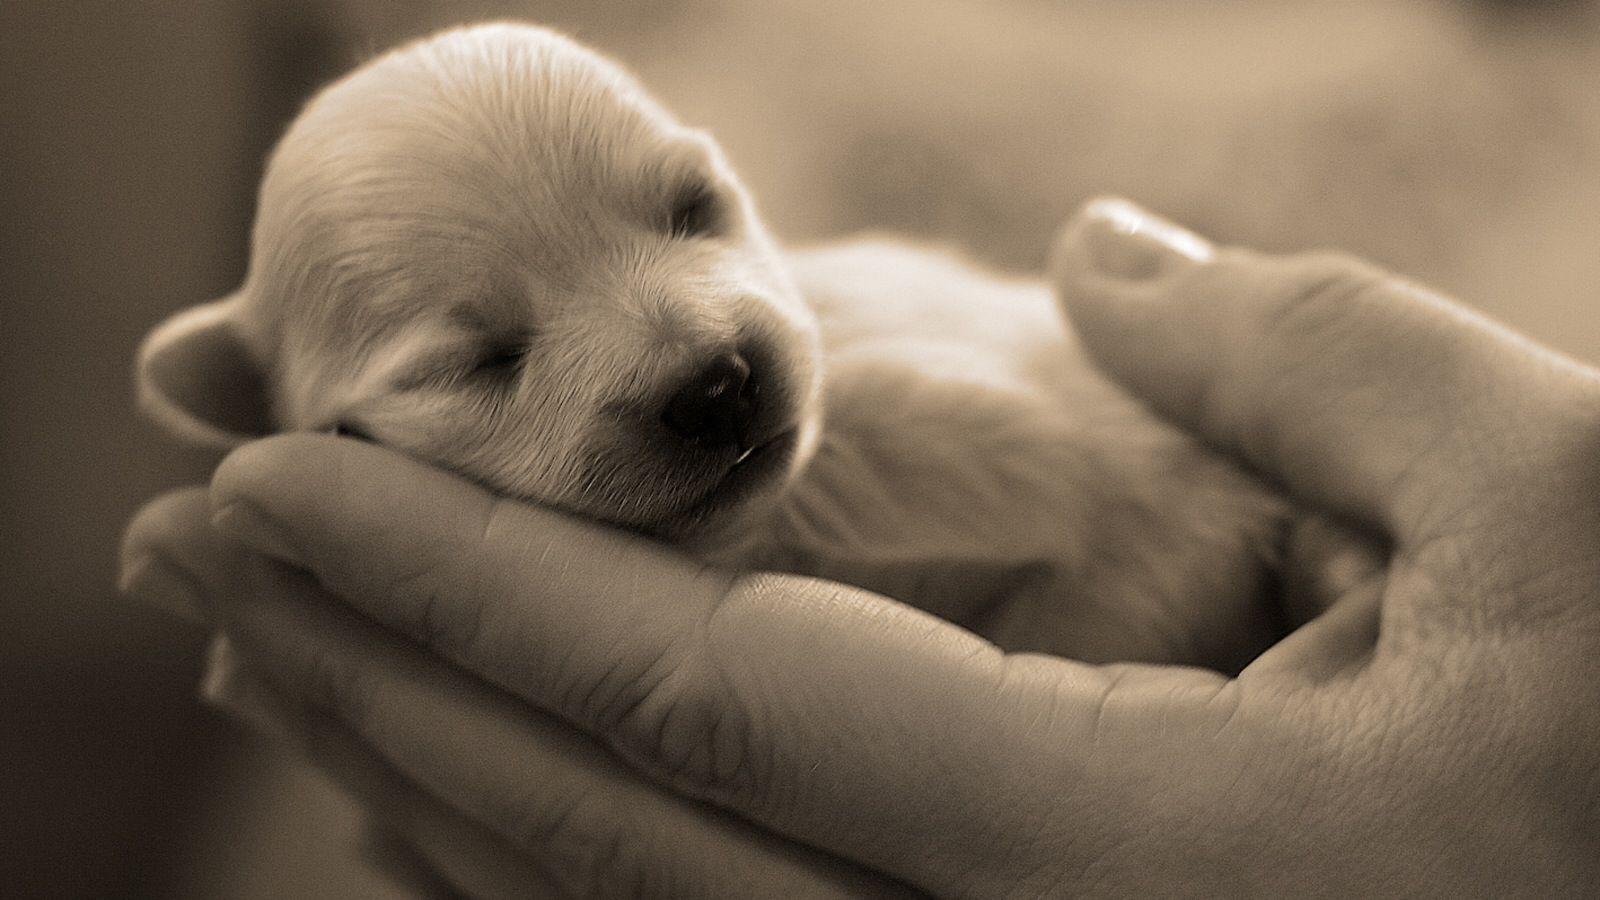 Sweet baby...